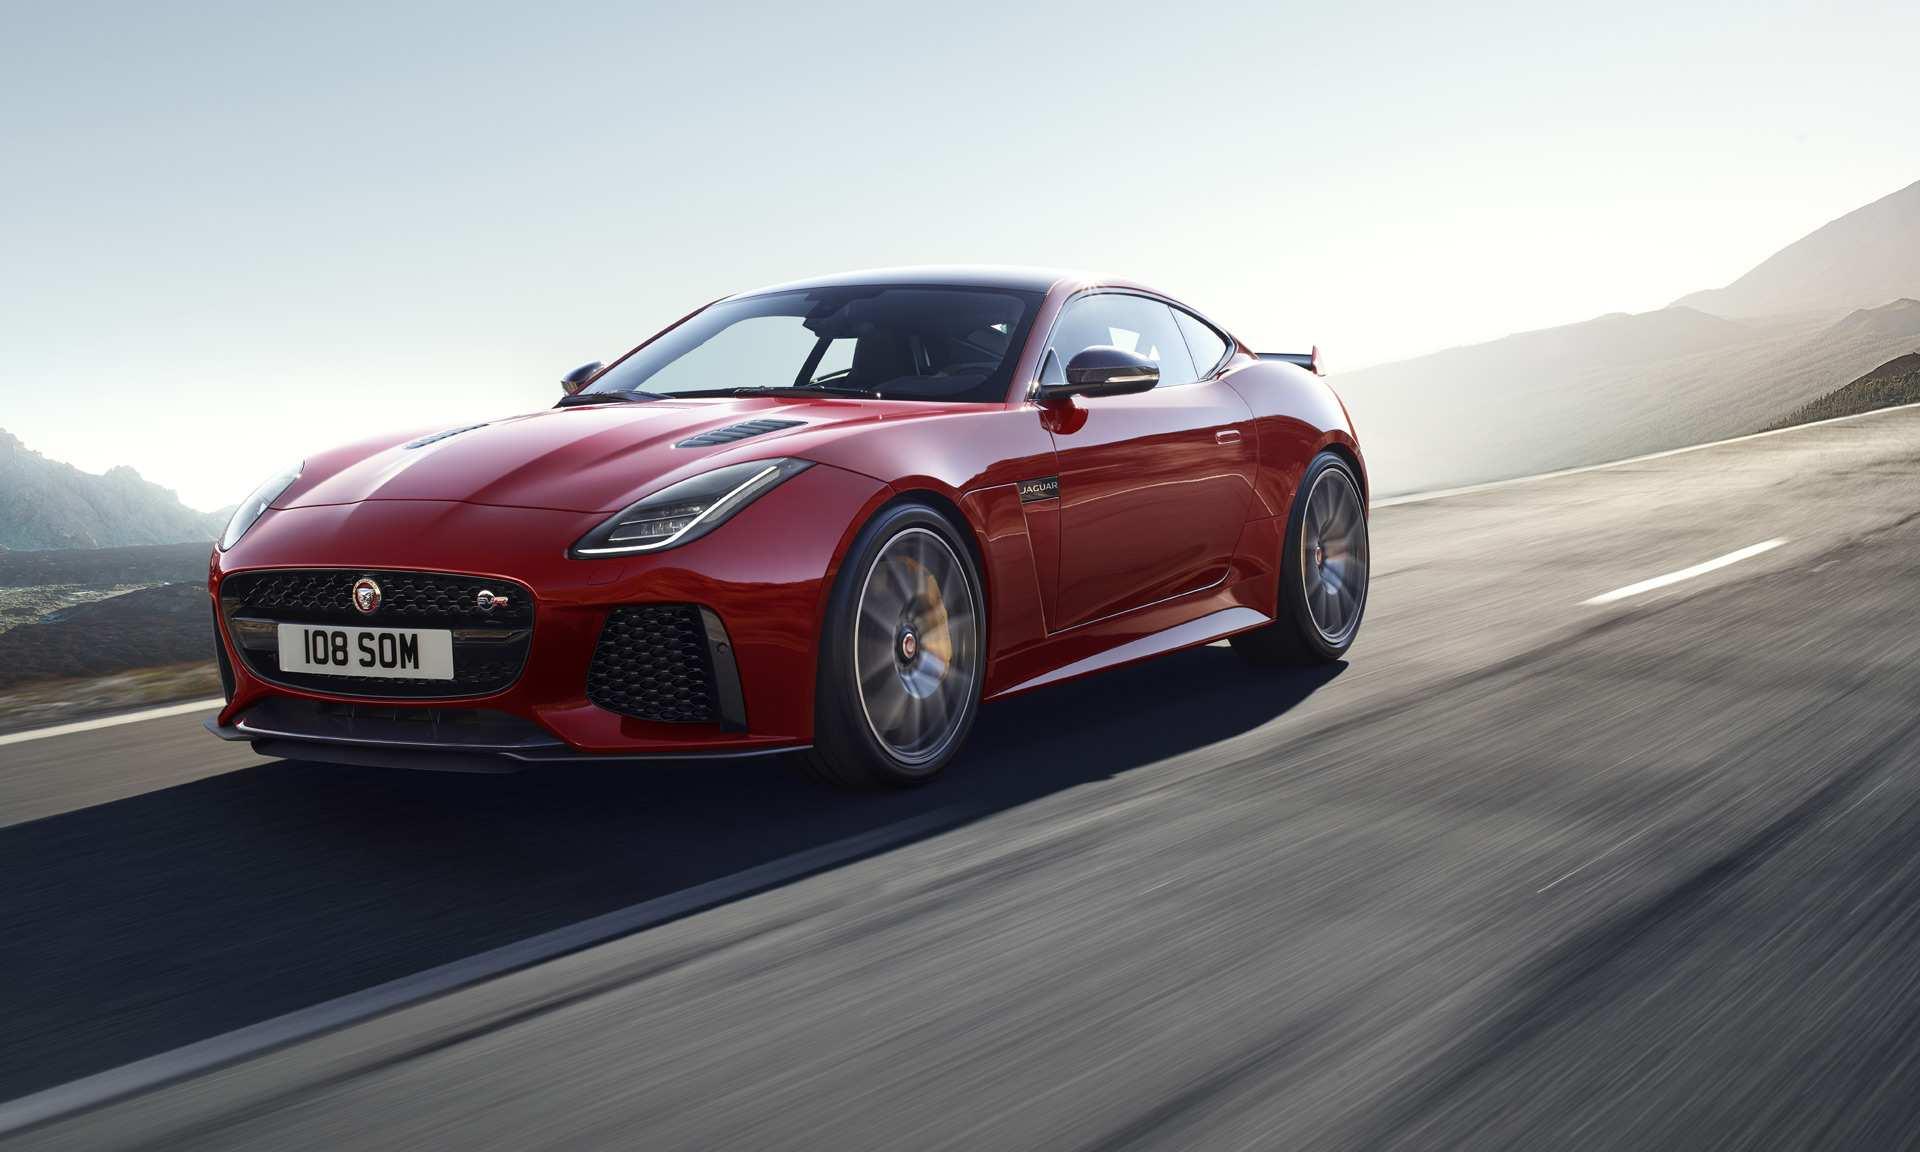 43 Concept of Best 2019 Jaguar F Type Release Date Review And Release Date Price by Best 2019 Jaguar F Type Release Date Review And Release Date